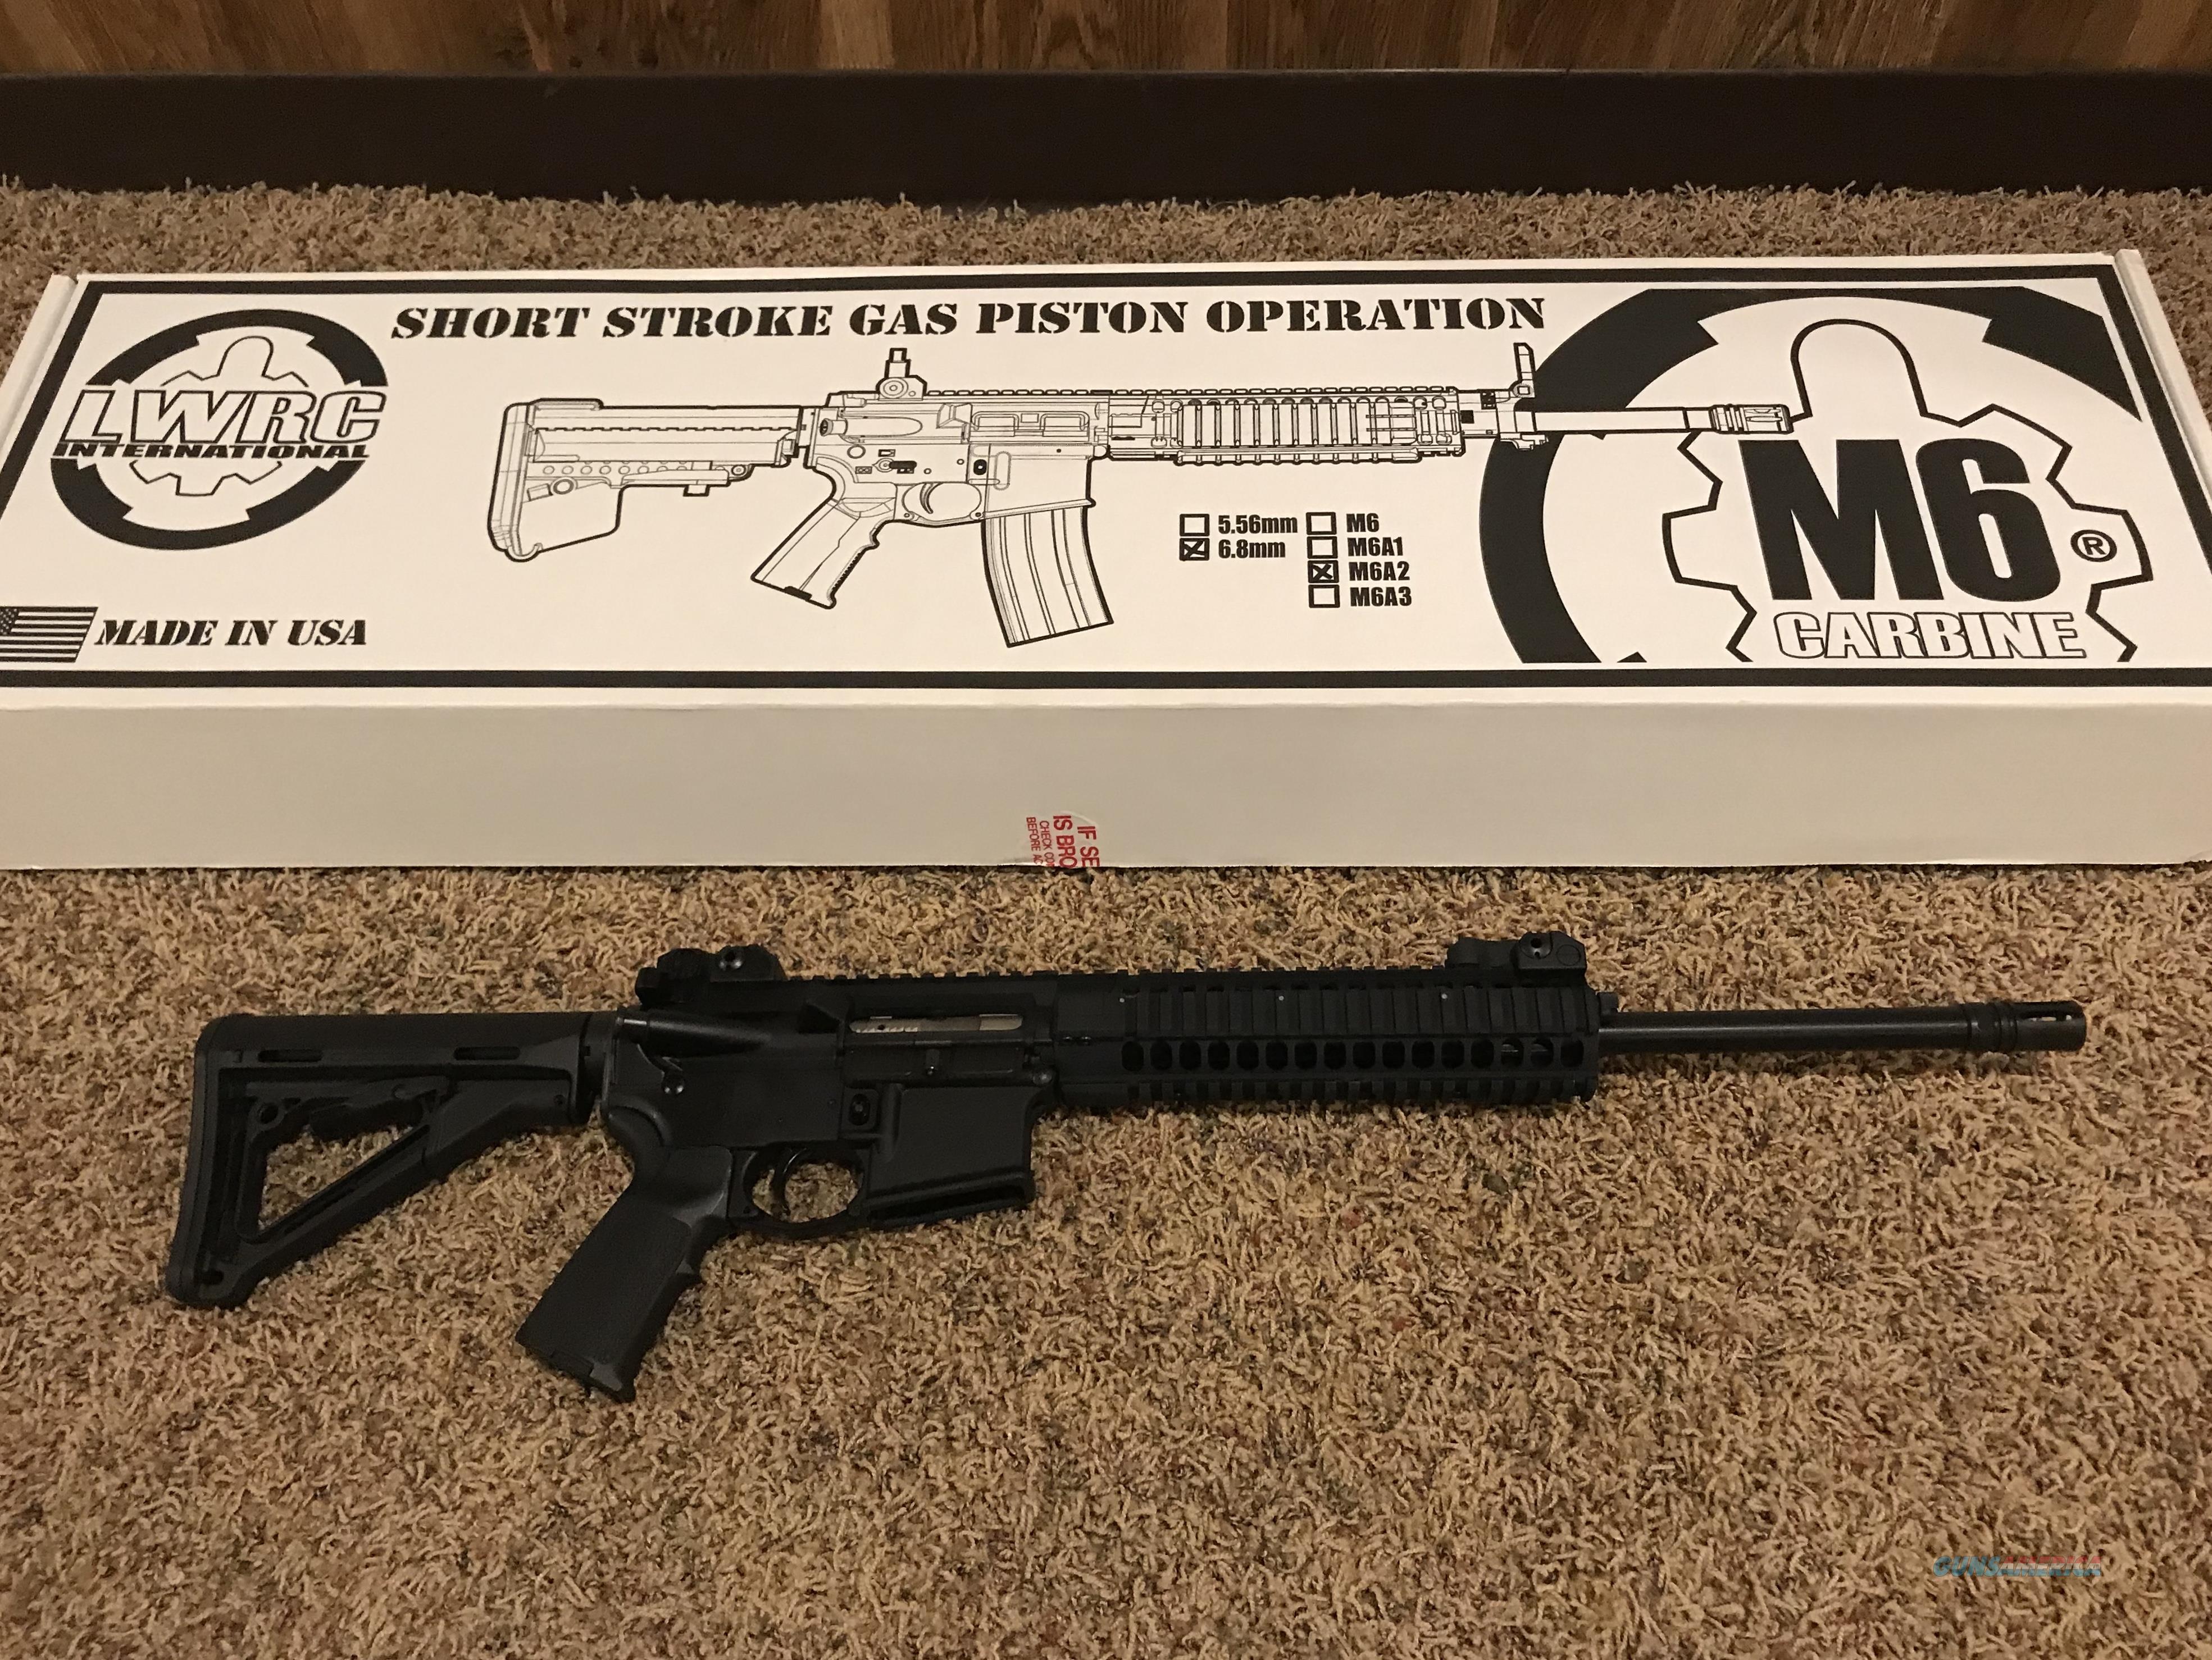 LWRC  M6A2  6.8 SPC   short stroke piston  Guns > Rifles > LWRC Rifles